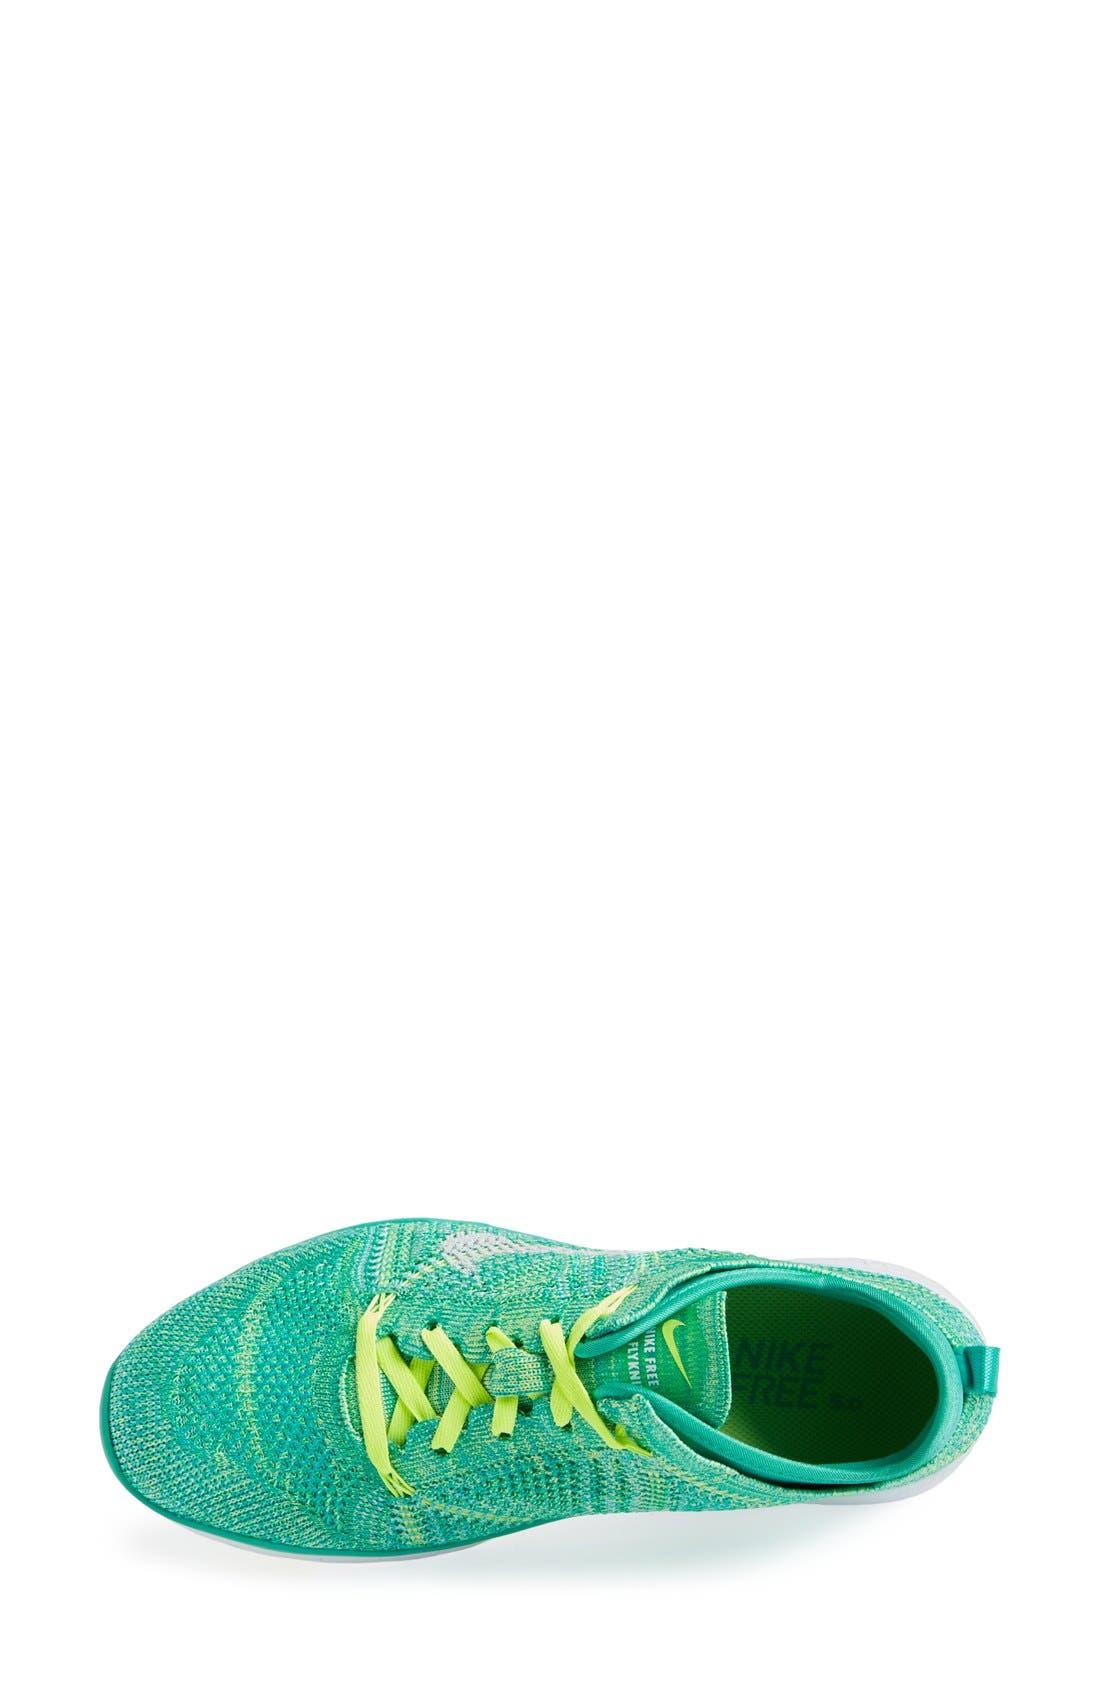 ,                             'Free Flyknit 5.0 TR' Training Shoe,                             Alternate thumbnail 23, color,                             303